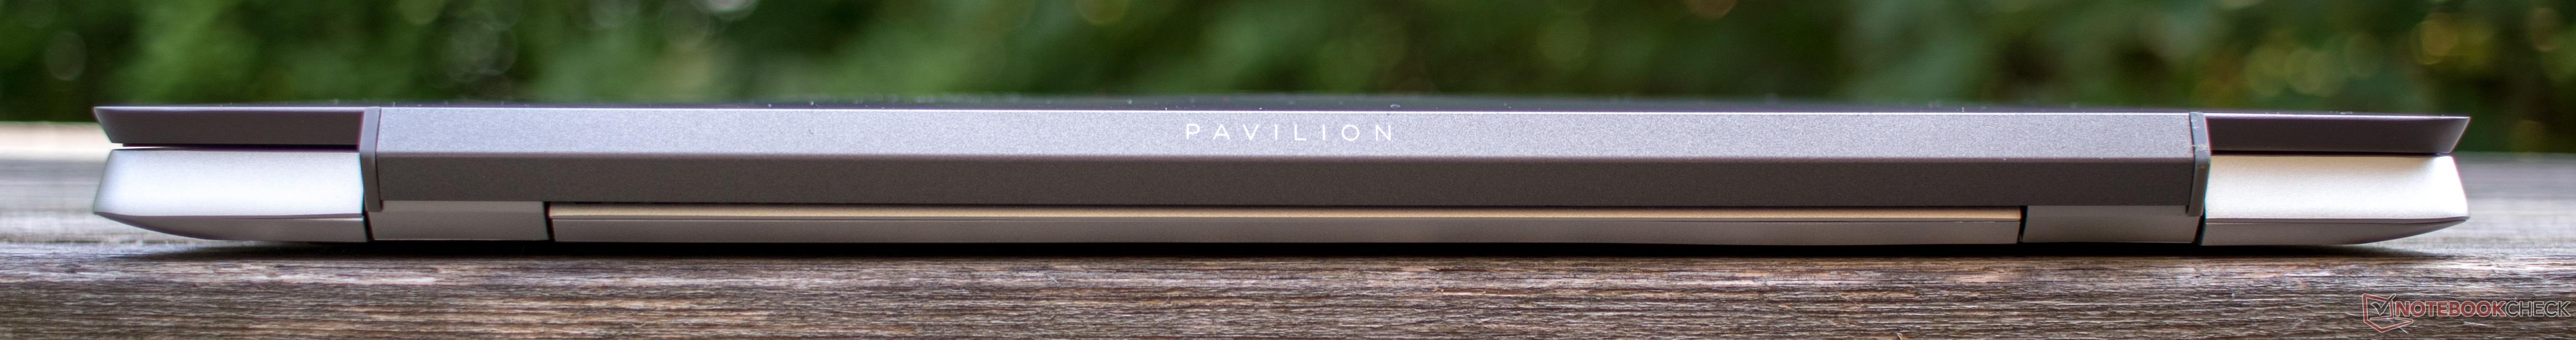 hp pavilion i7 8550u review